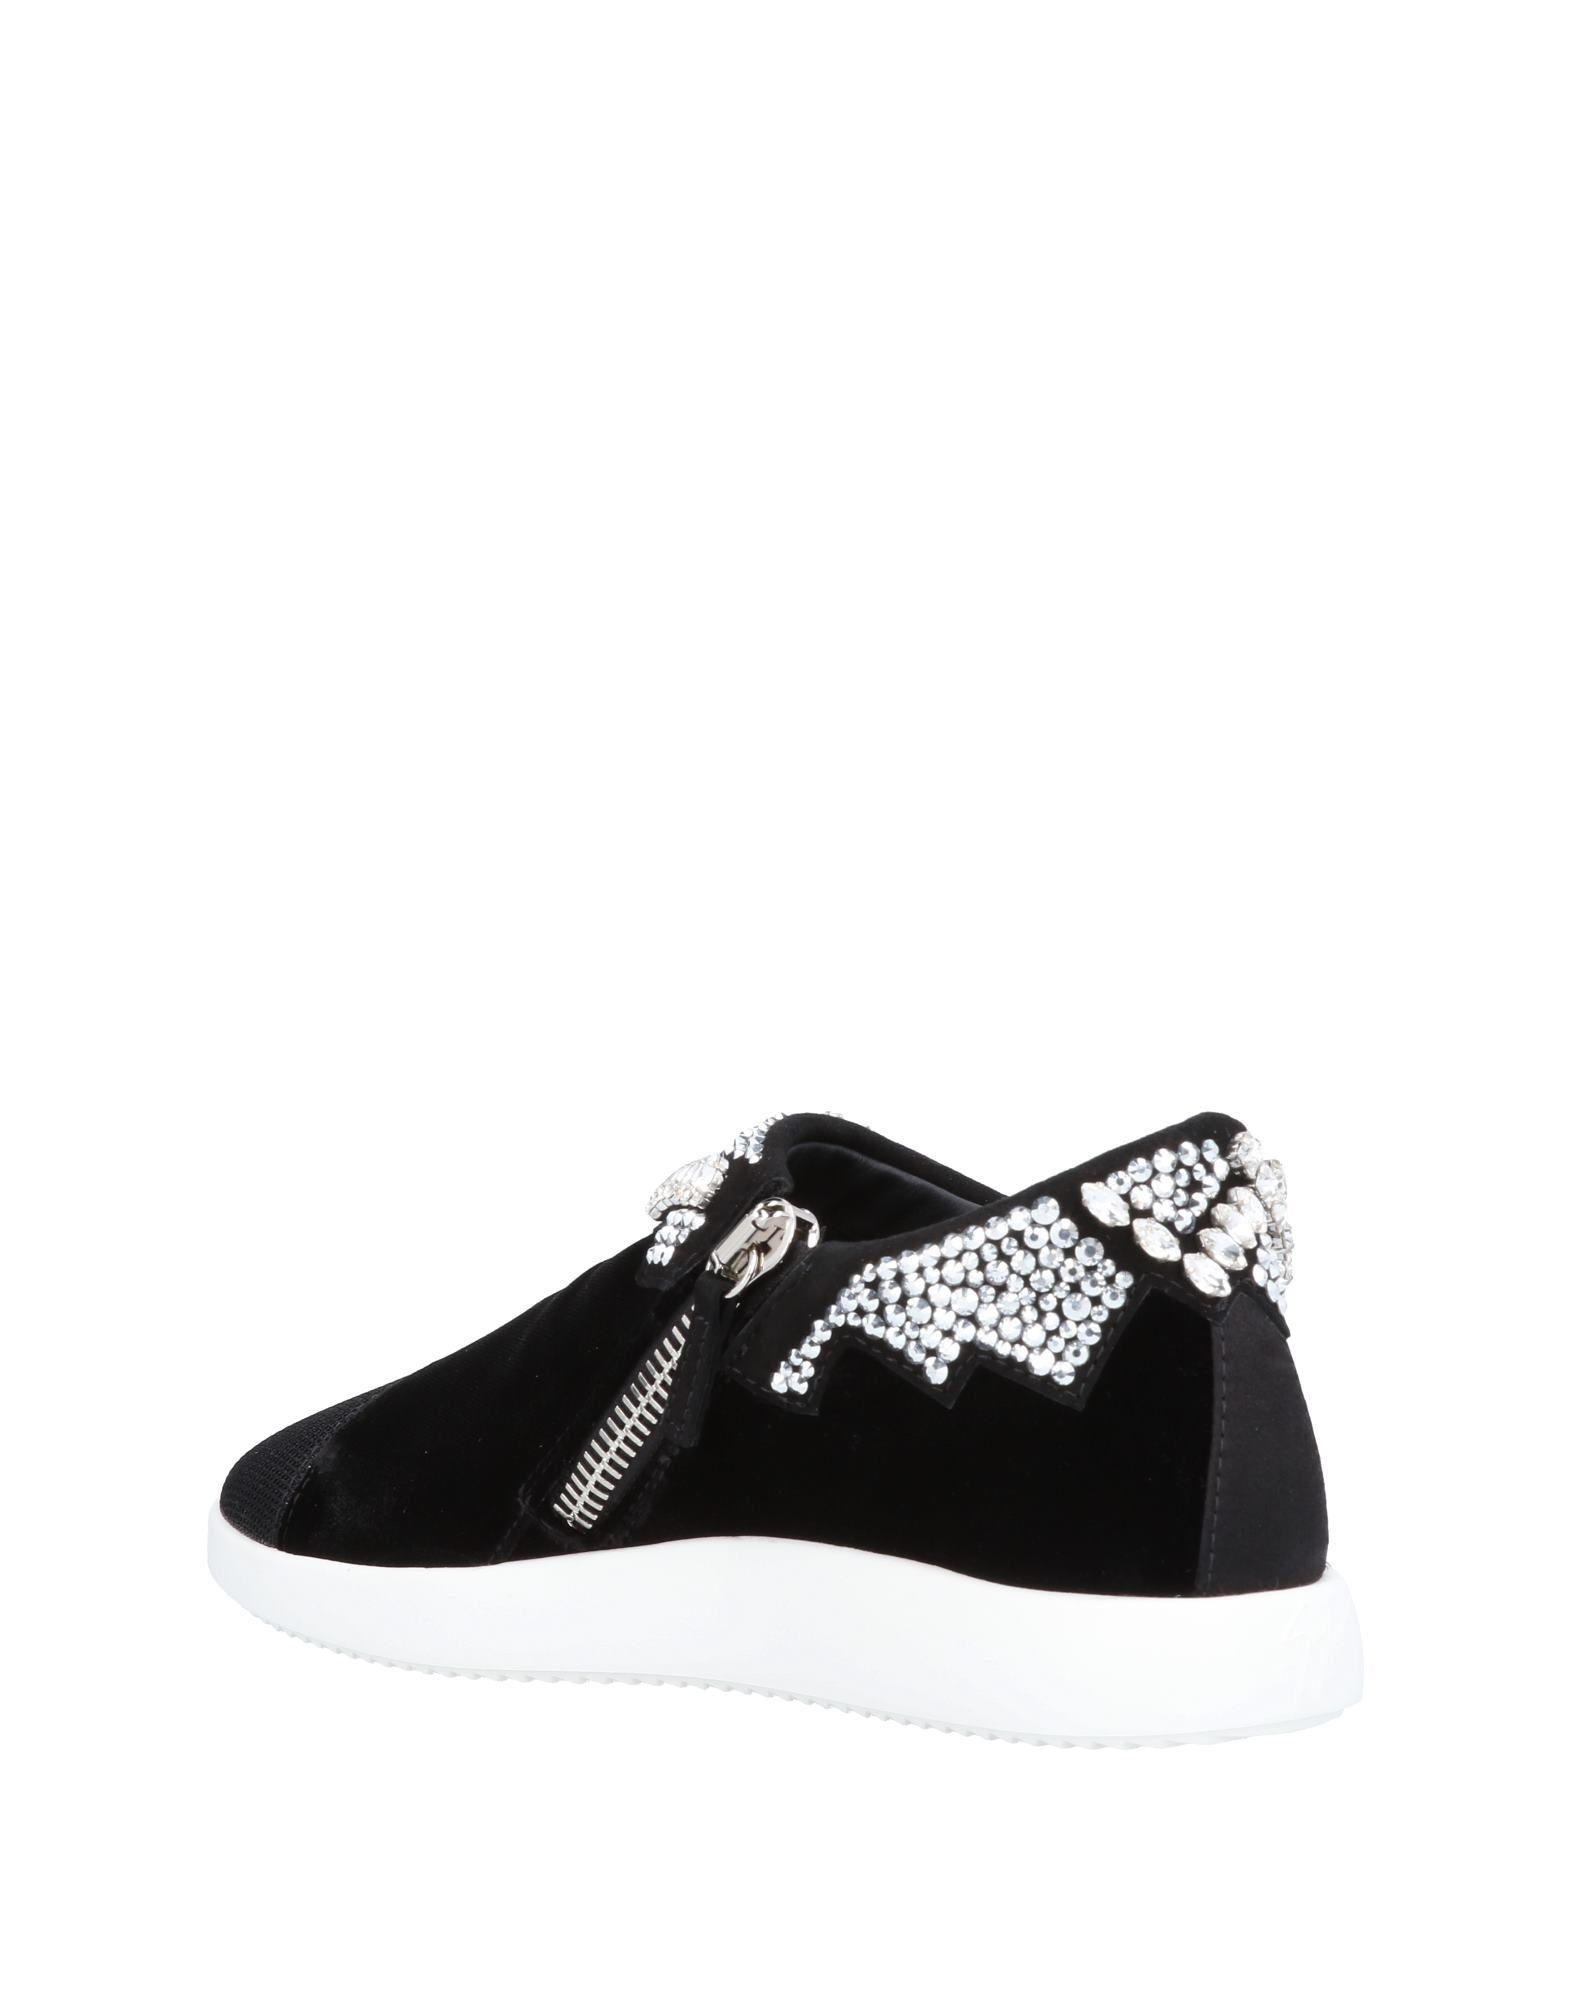 Giuseppe Zanotti  Sneakers Damen  Zanotti 11501212HP Beliebte Schuhe fee657